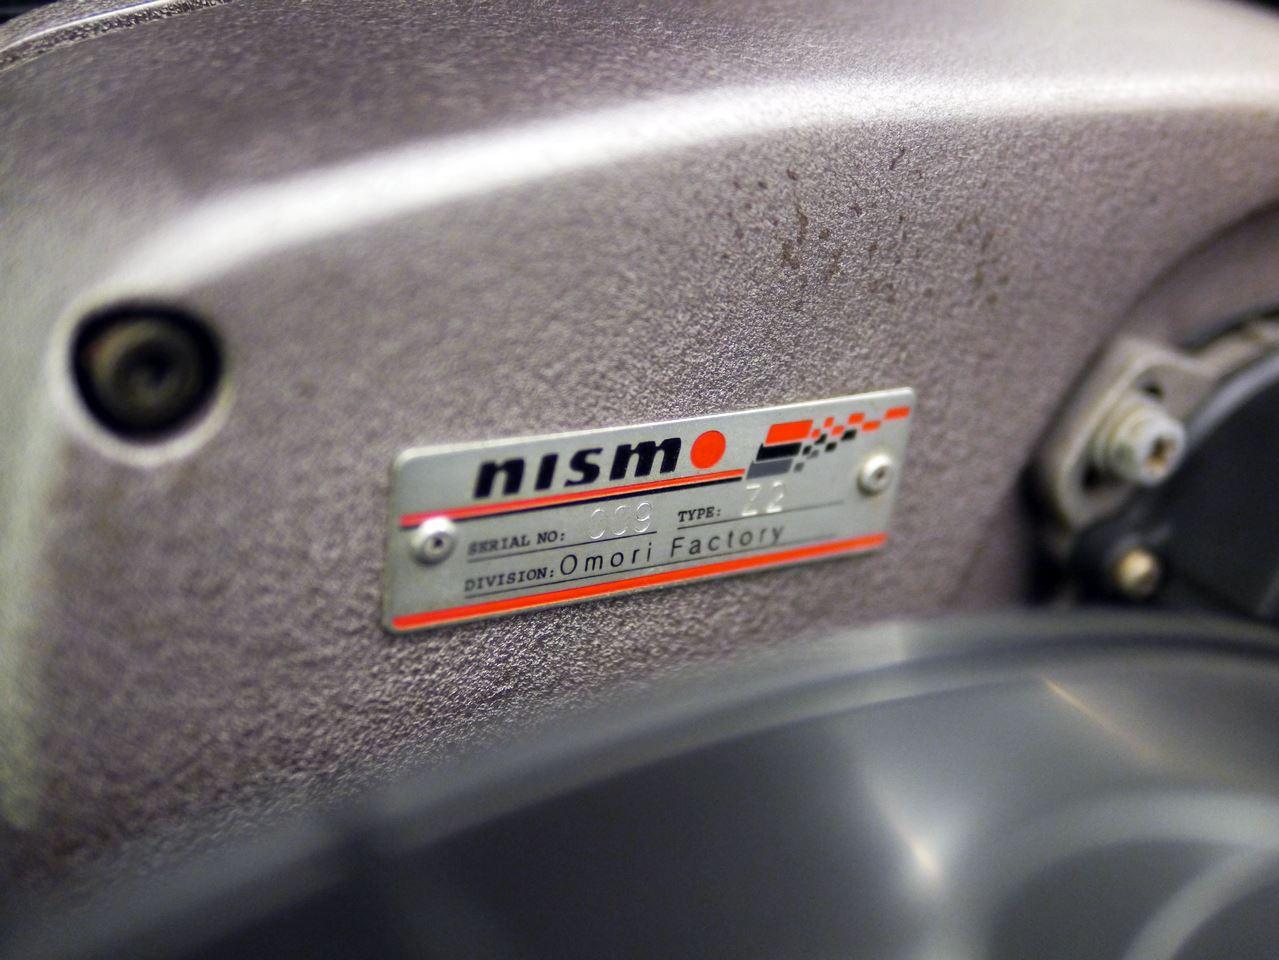 Nismo Nissan GT-R R34 Z -Tune for sale (7)